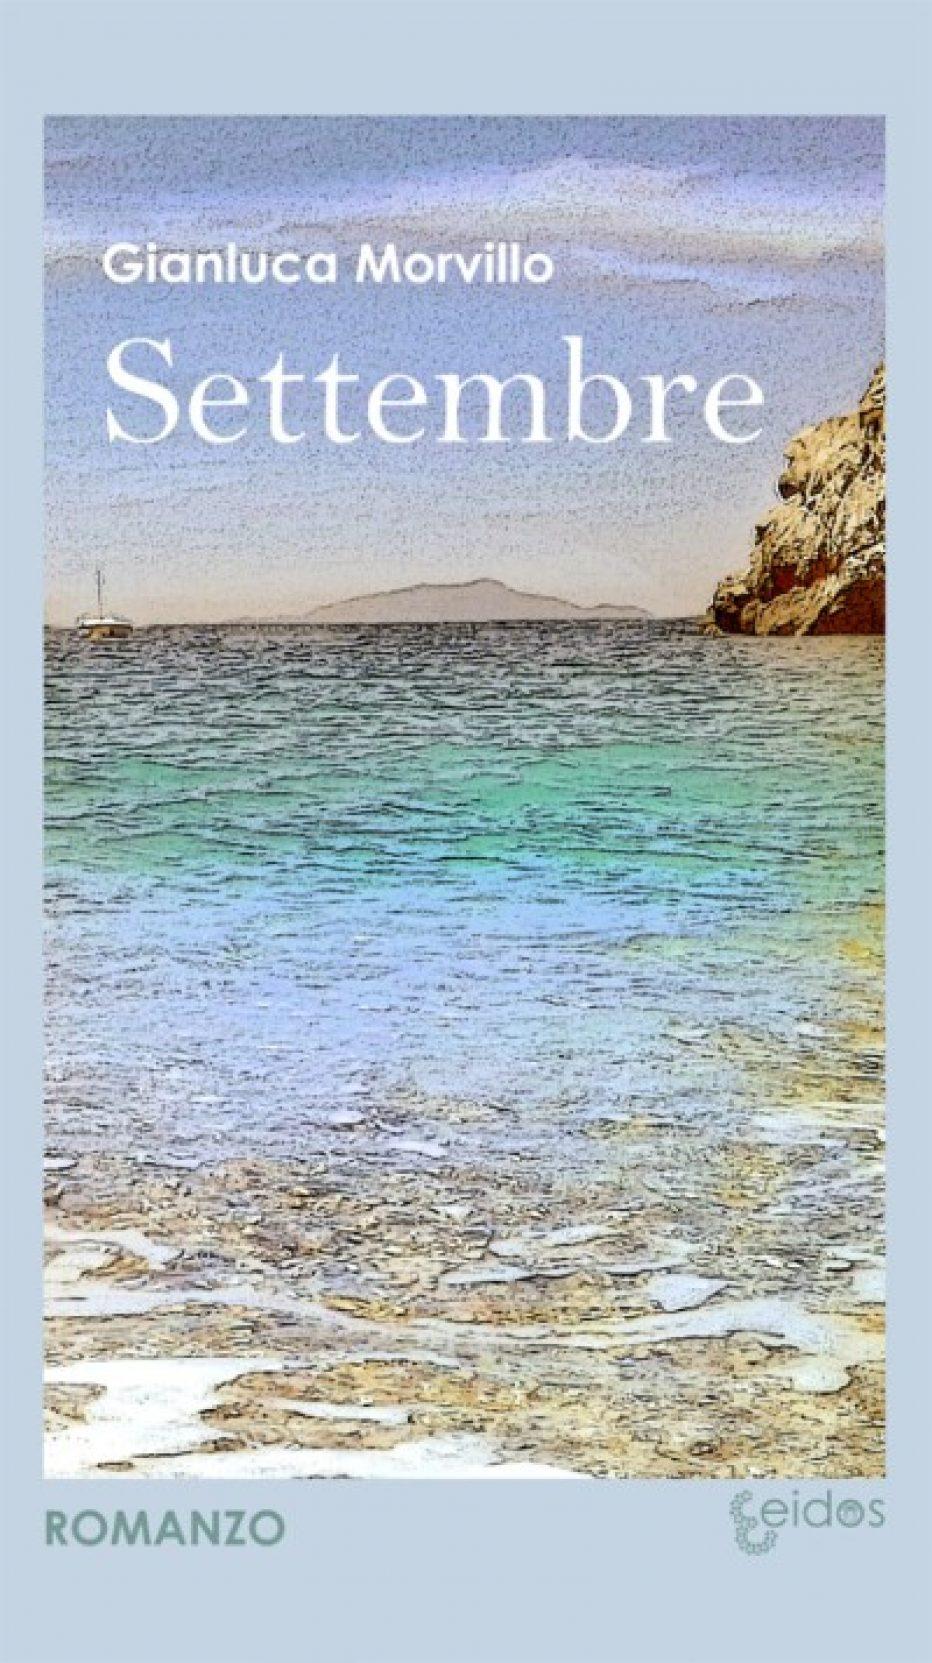 Settembre, esordio narrativo di Gianluca Morvillo